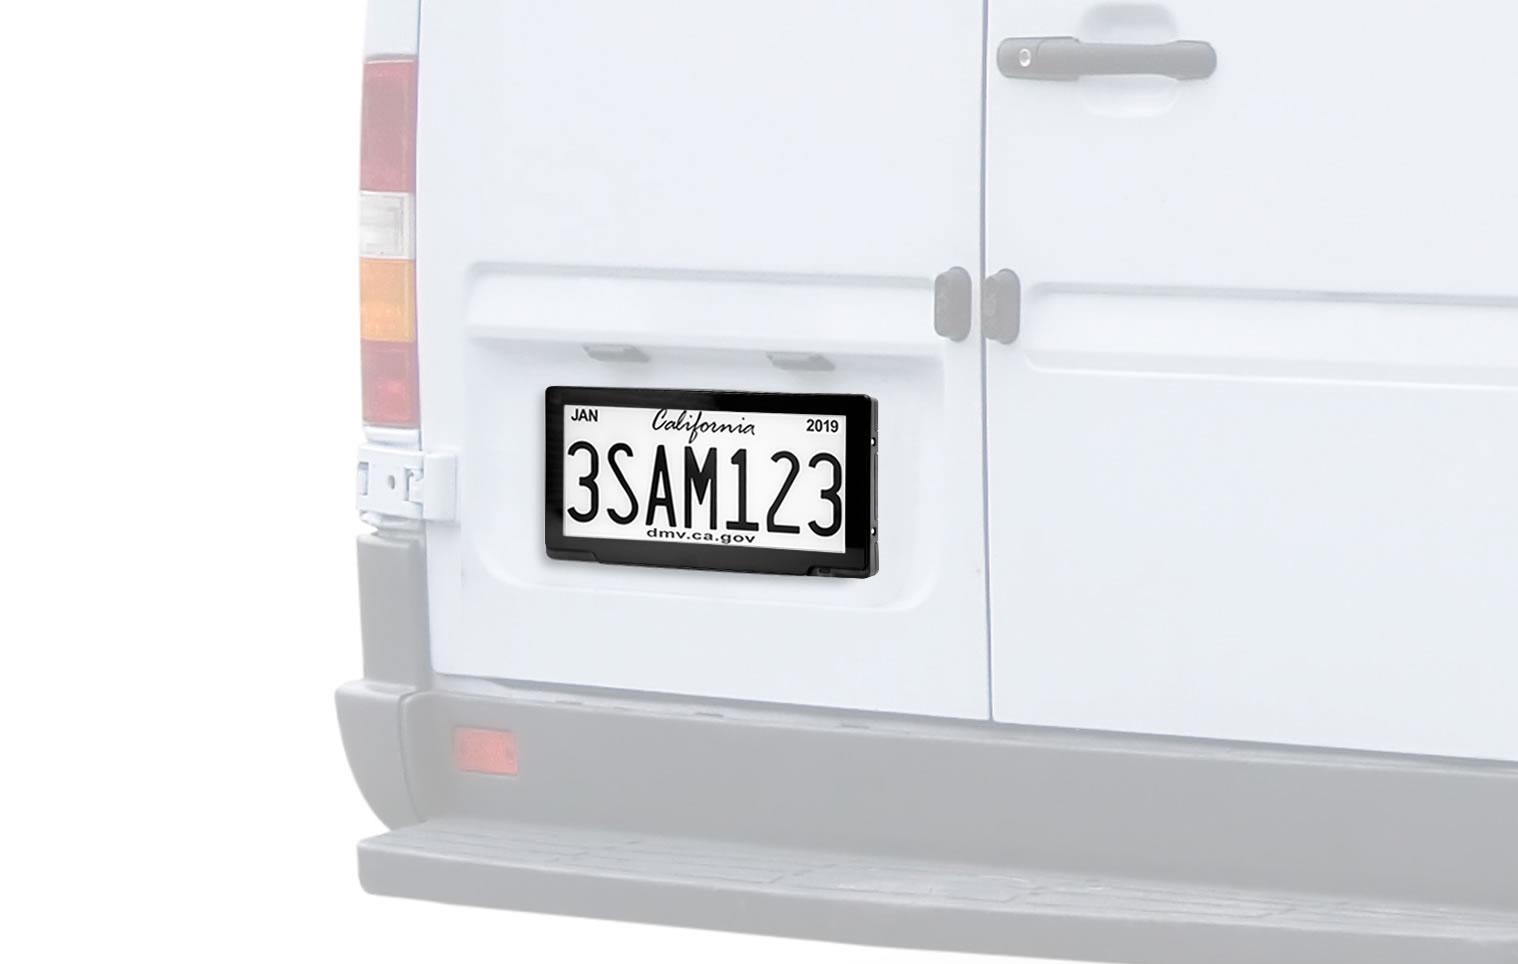 Front License Plate Stolen Texas - Best Plate 2018